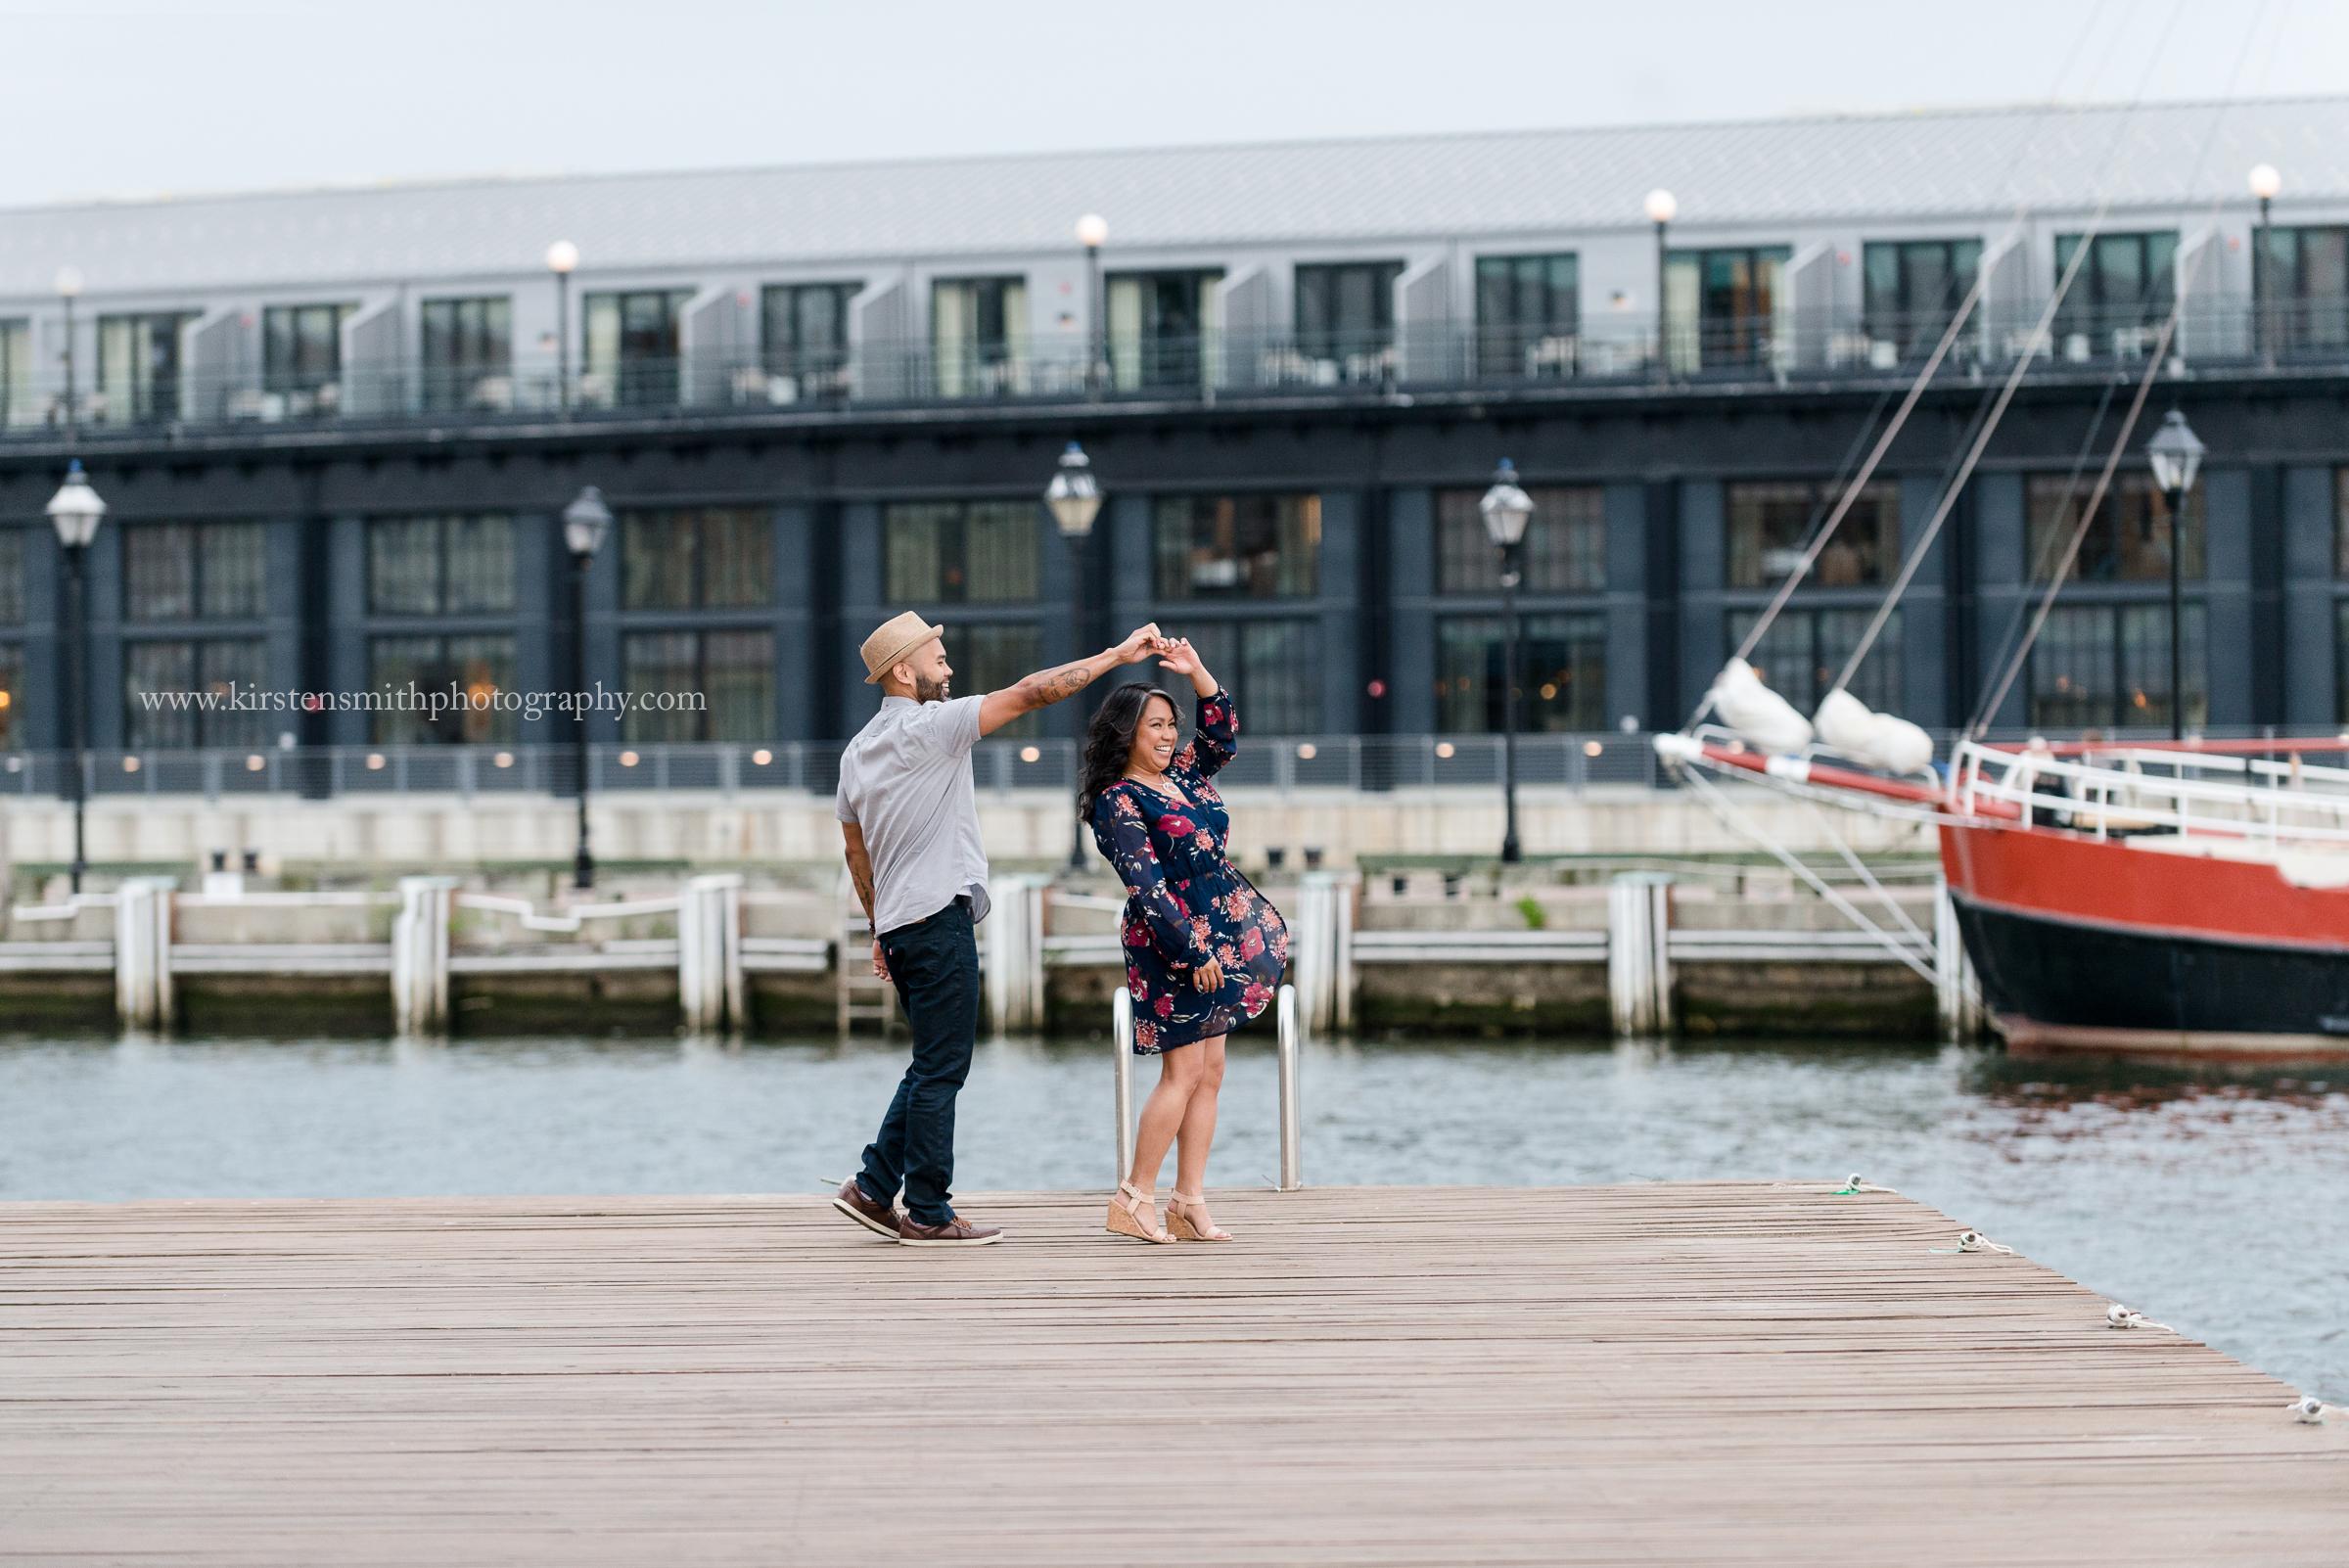 Kirsten-Smith-Photography-Diana-Mick-Engagement-0130-wm.jpg